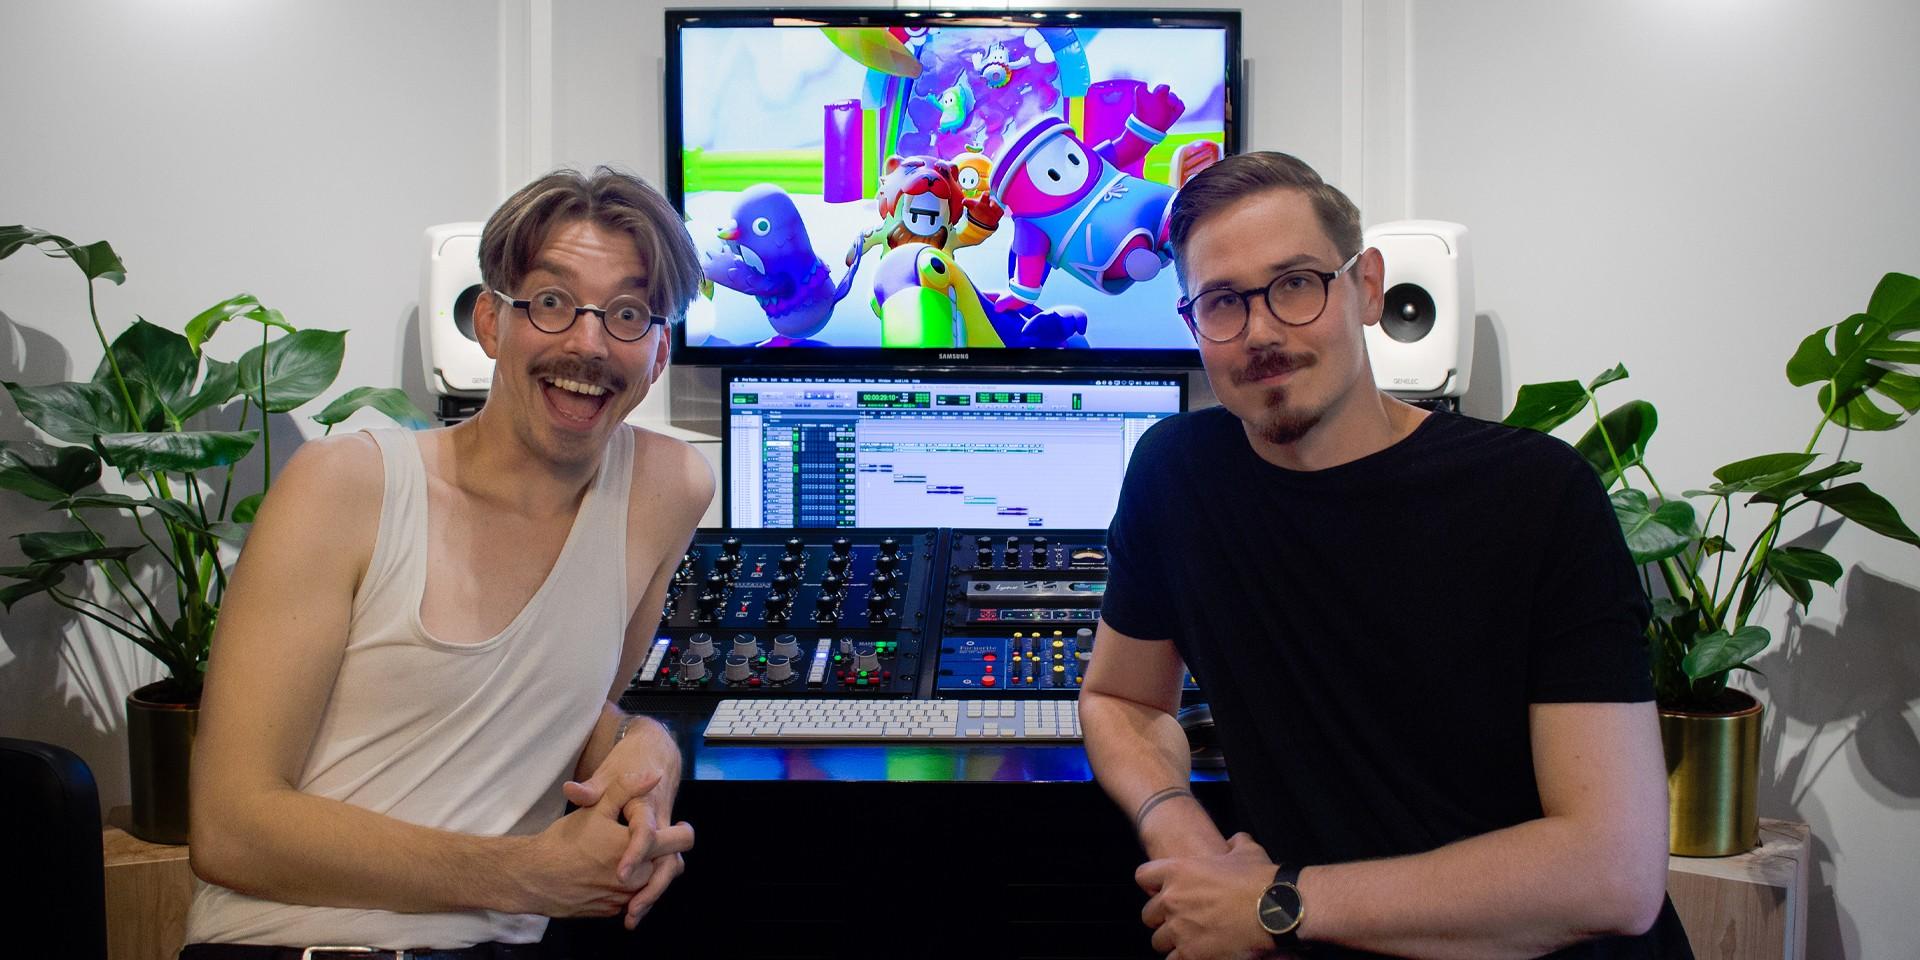 Daniel Hagström and Jukio Kallio talk about the creation of the Fall Guys soundtrack